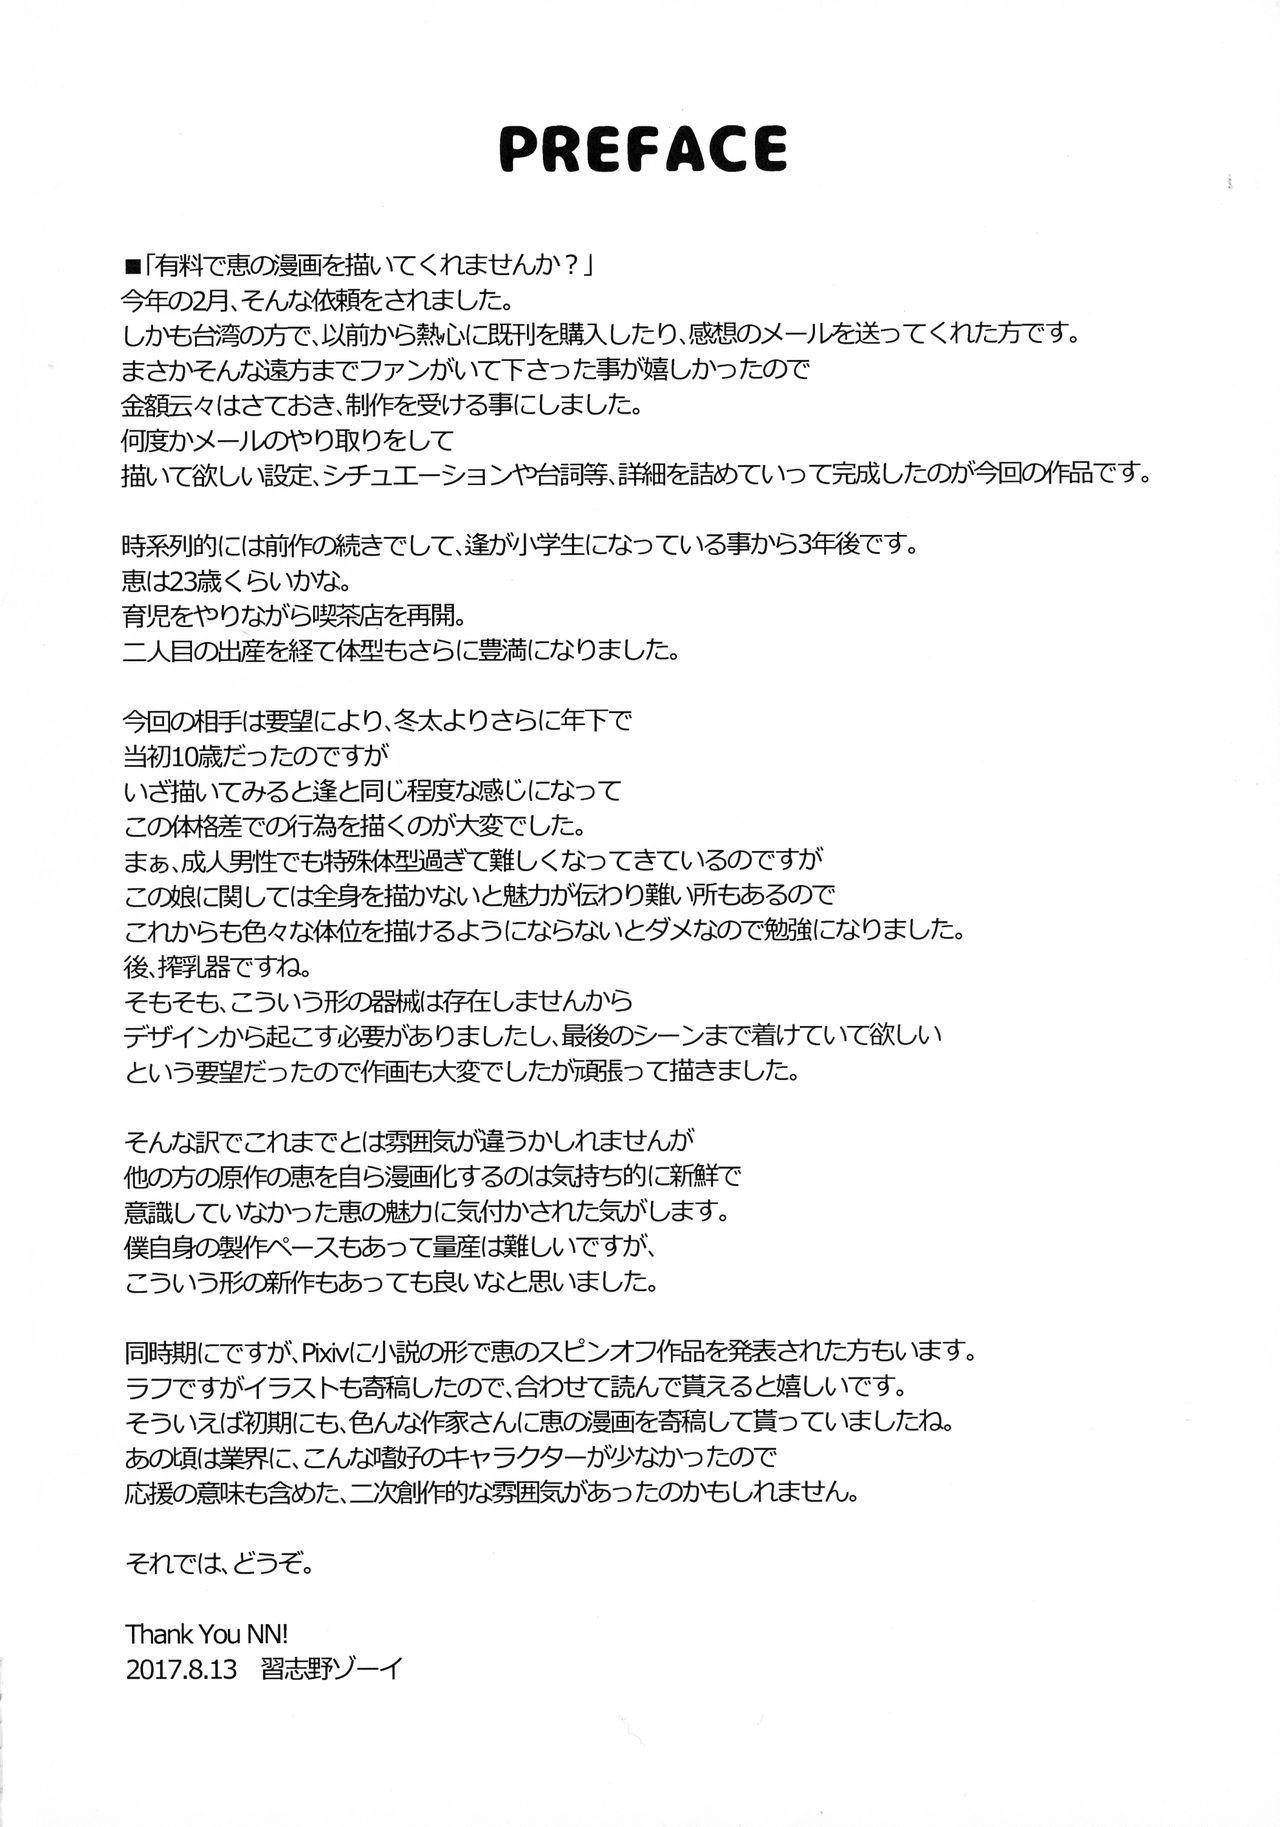 Megumi Ushi to Shounen 2